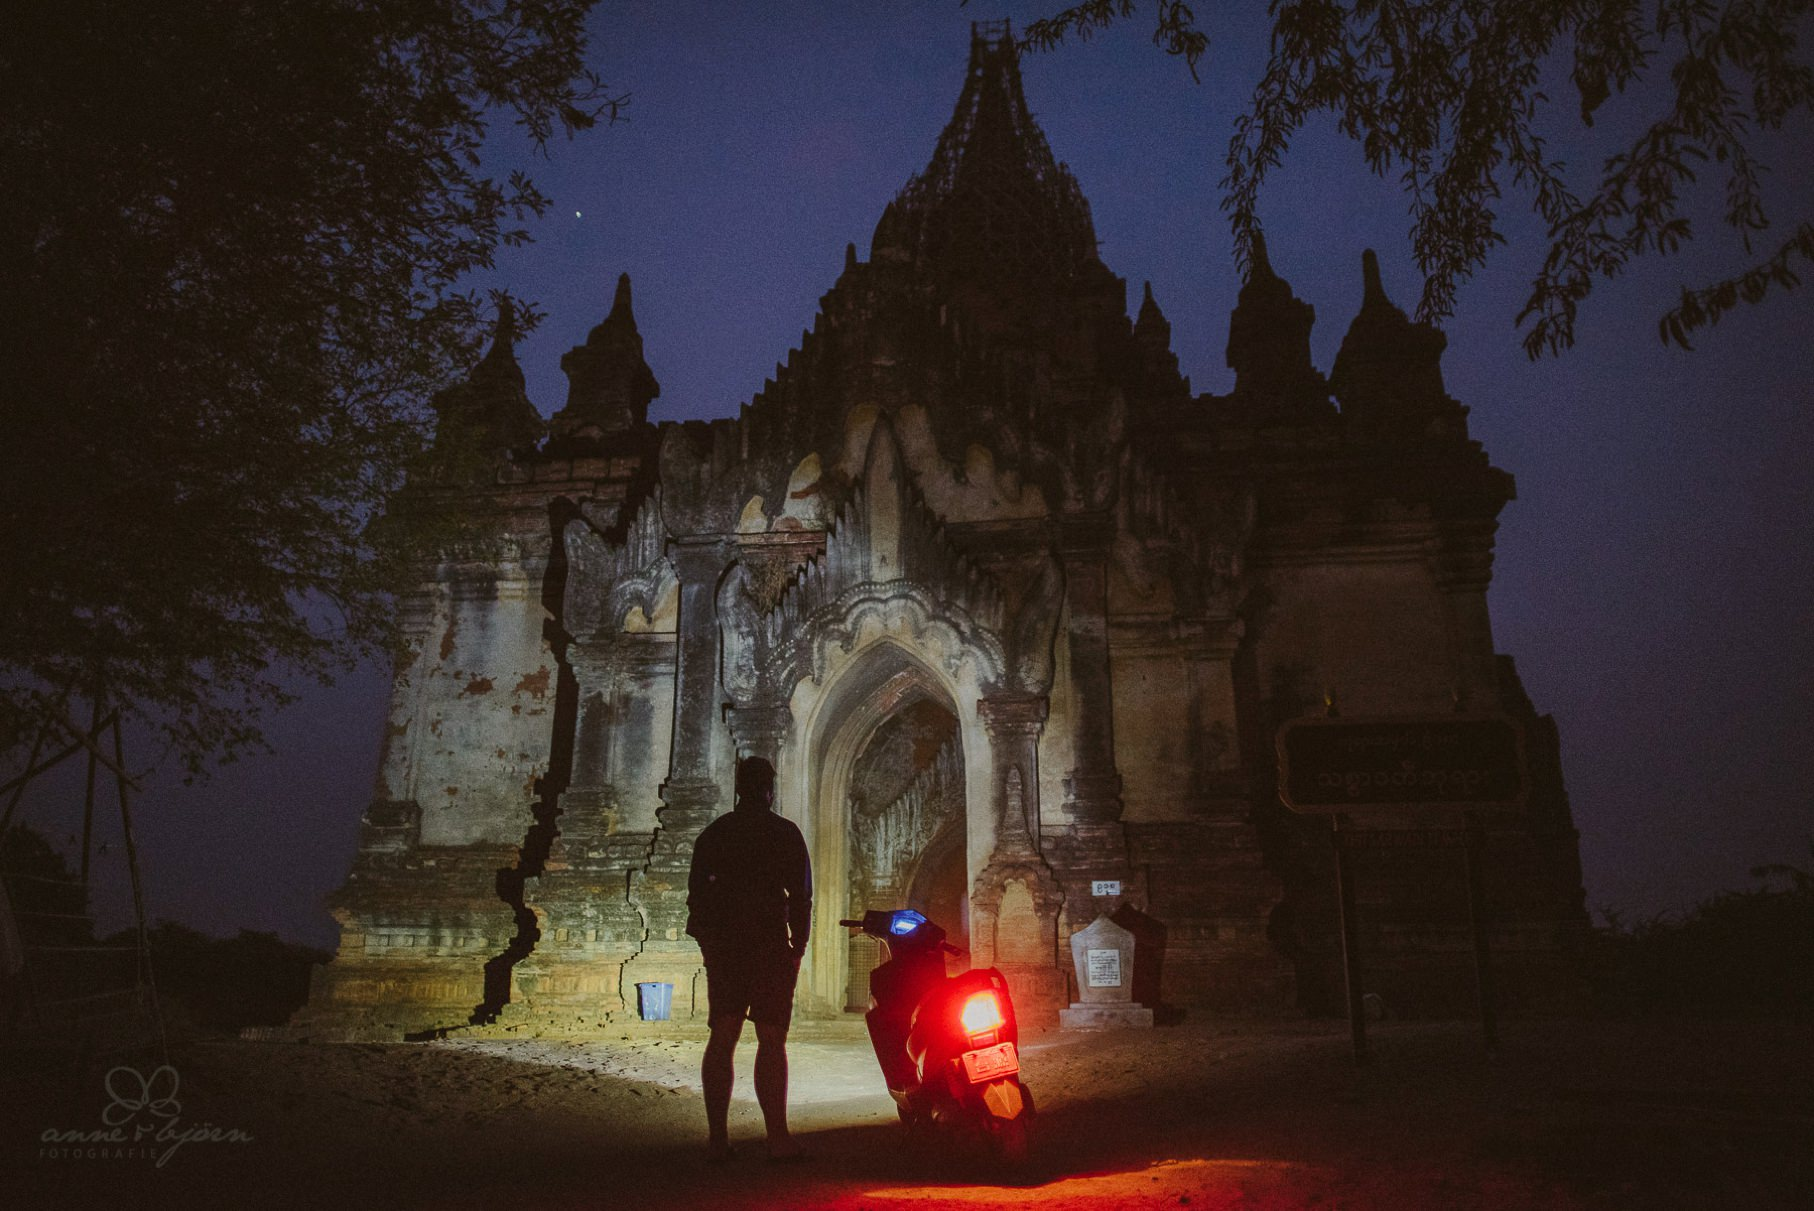 0001 bagan ngwesaung d76 7903 1 - Tempelstadt Bagan & tauchen am Ngwesaungbeach